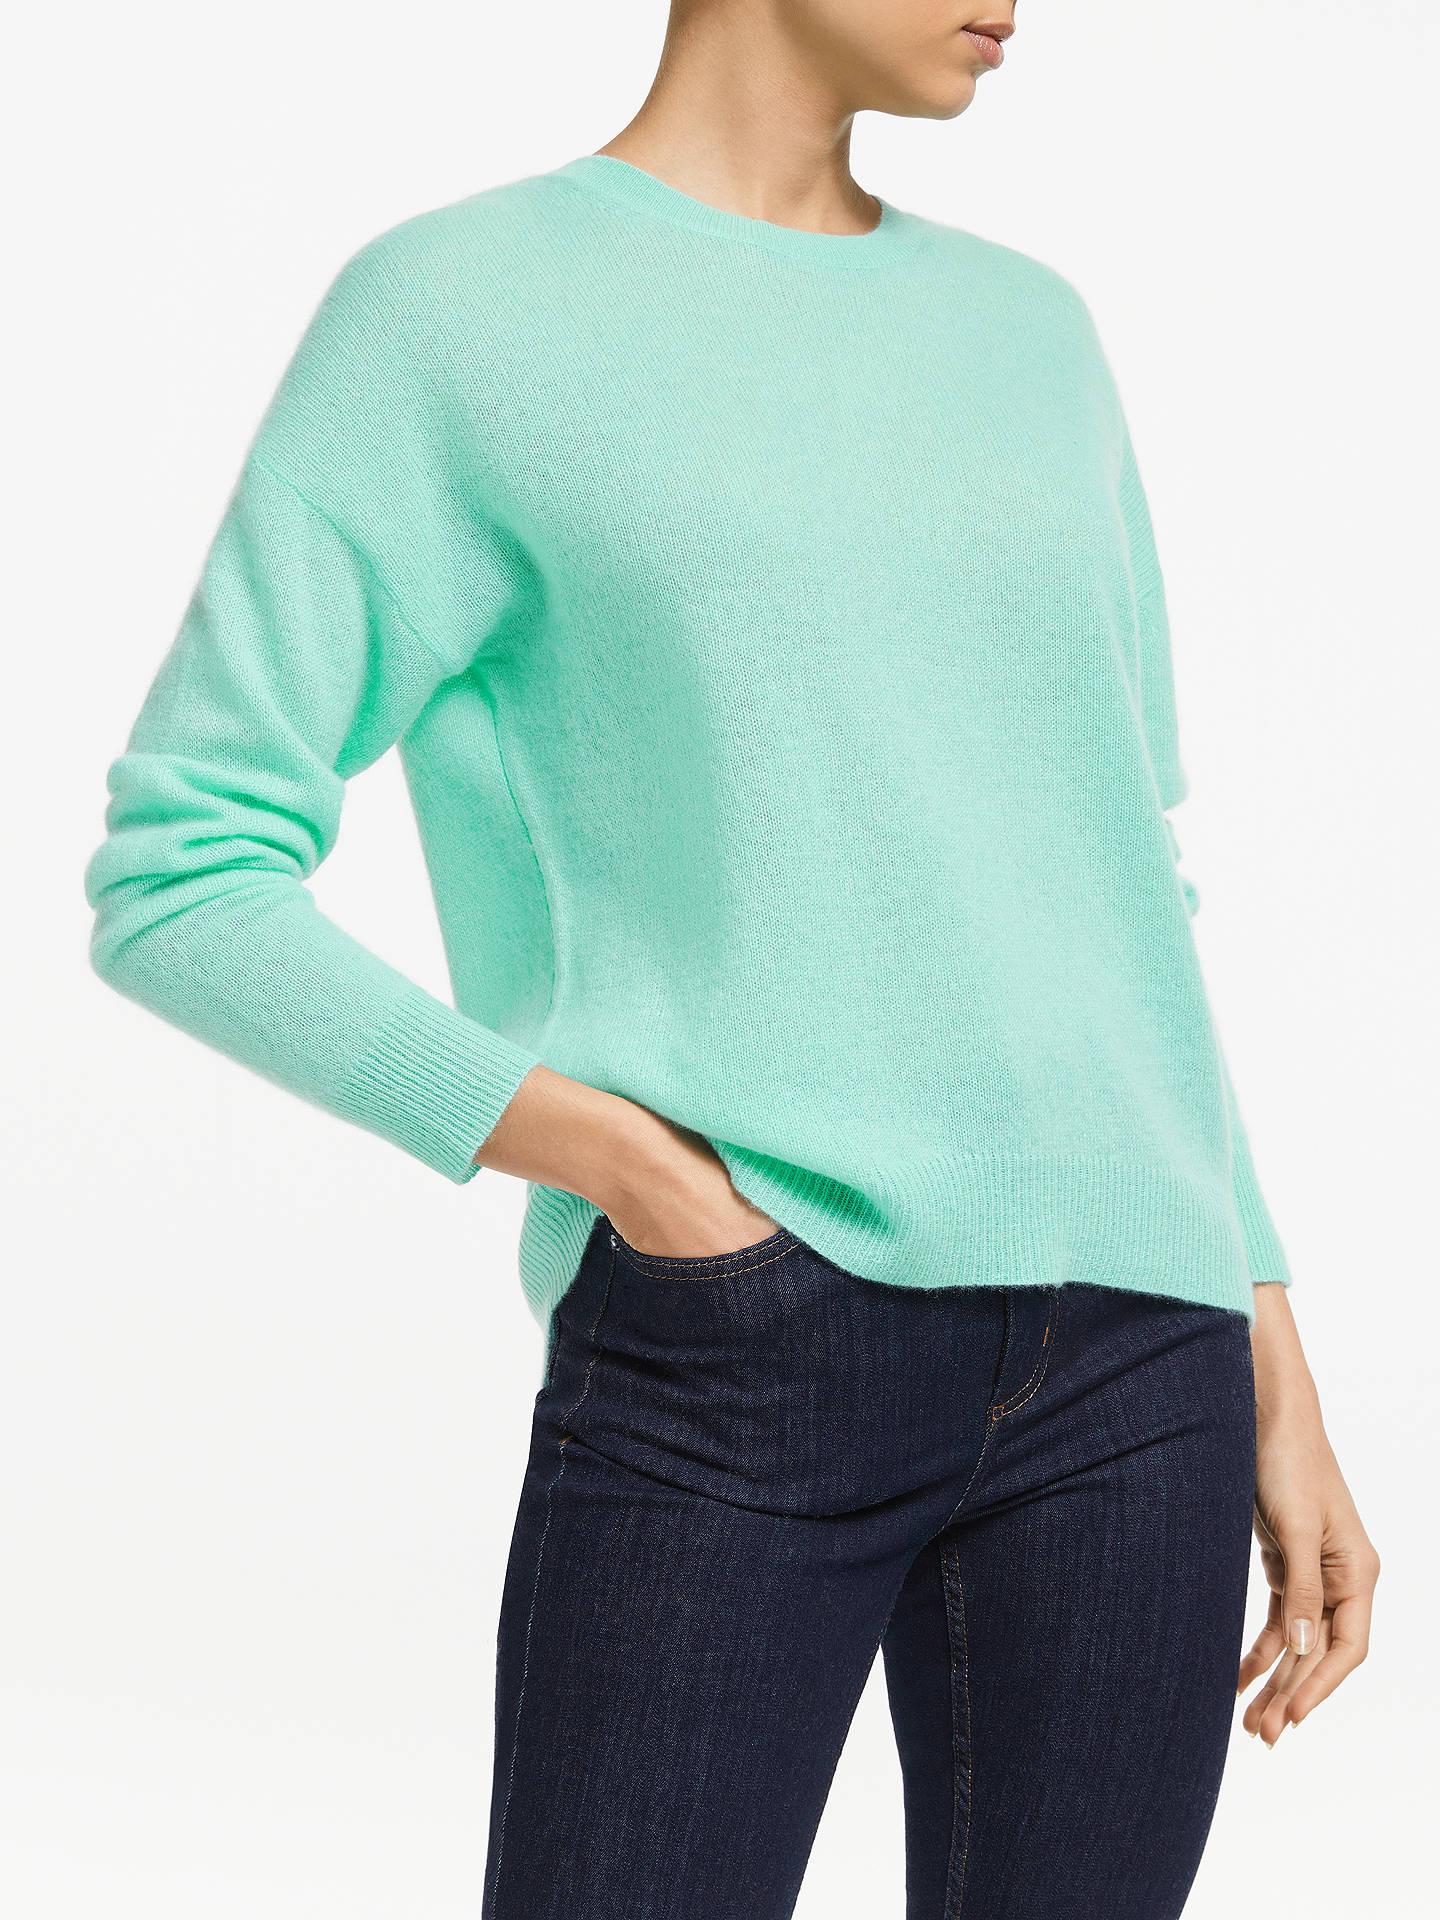 d7870acba07 360 Sweater Camille Pure Cashmere Jumper, Seagreen